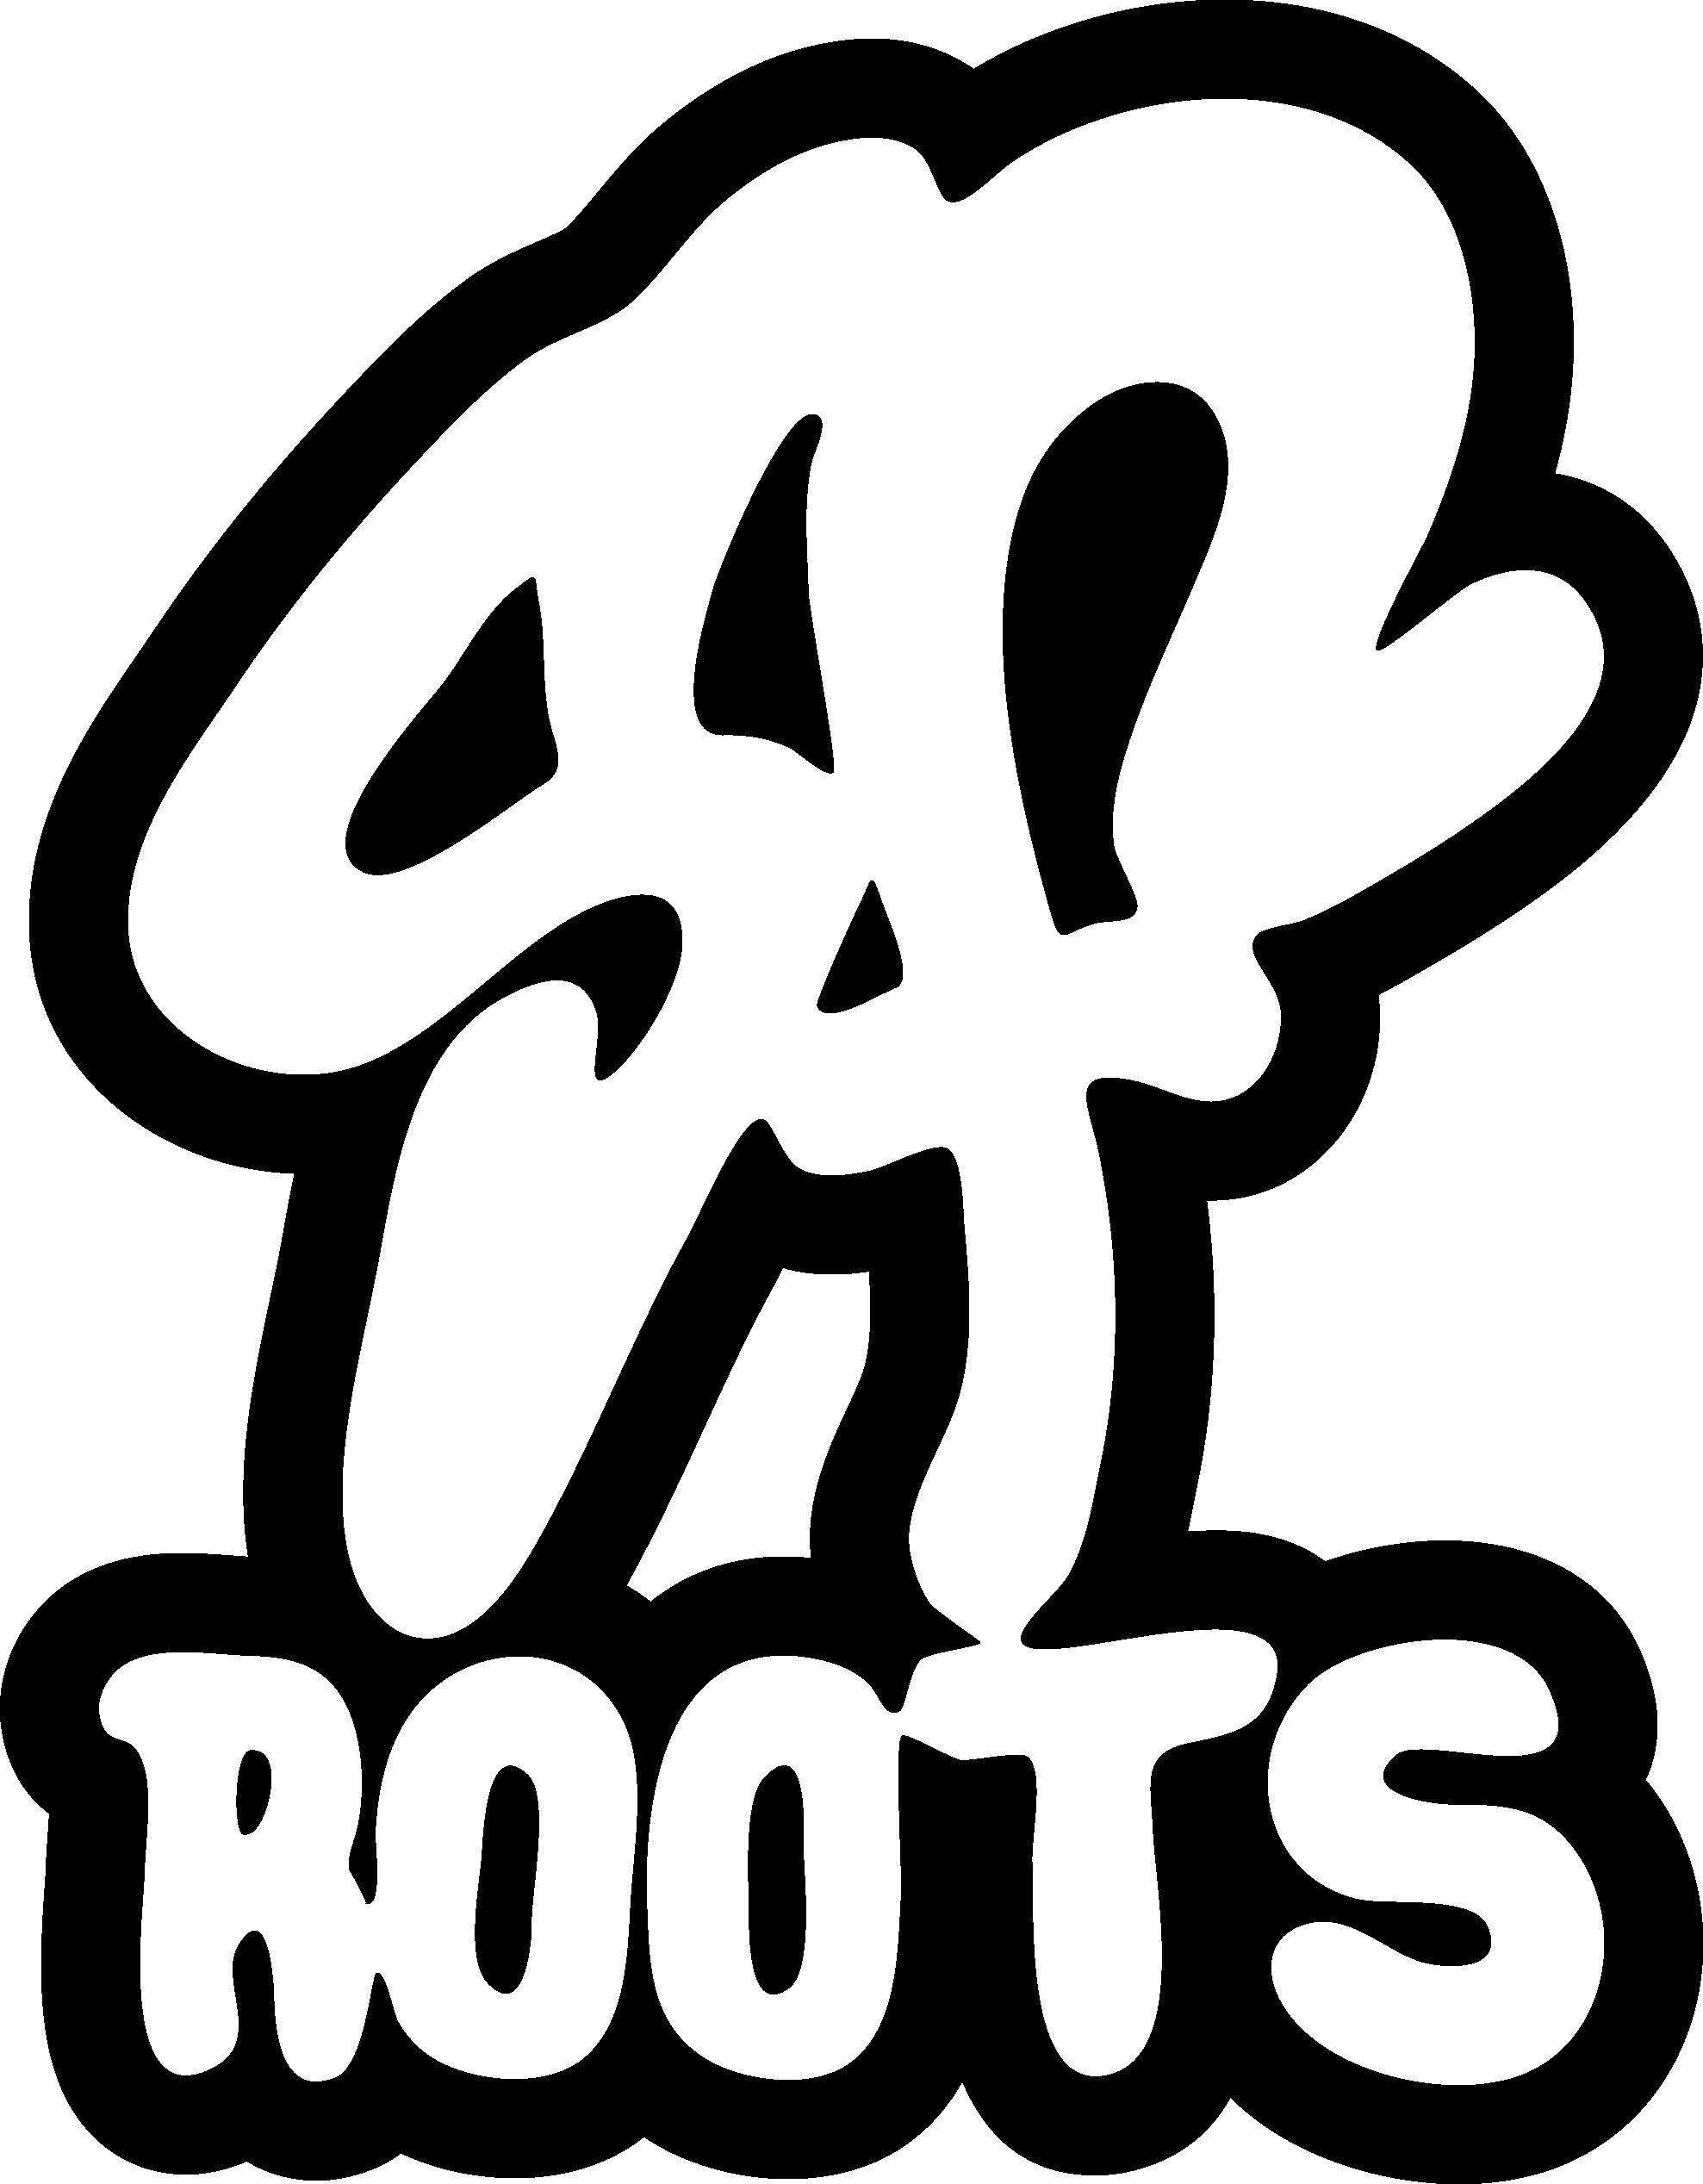 sf_roots_logo_rgb_hollow_black@4x (1).png